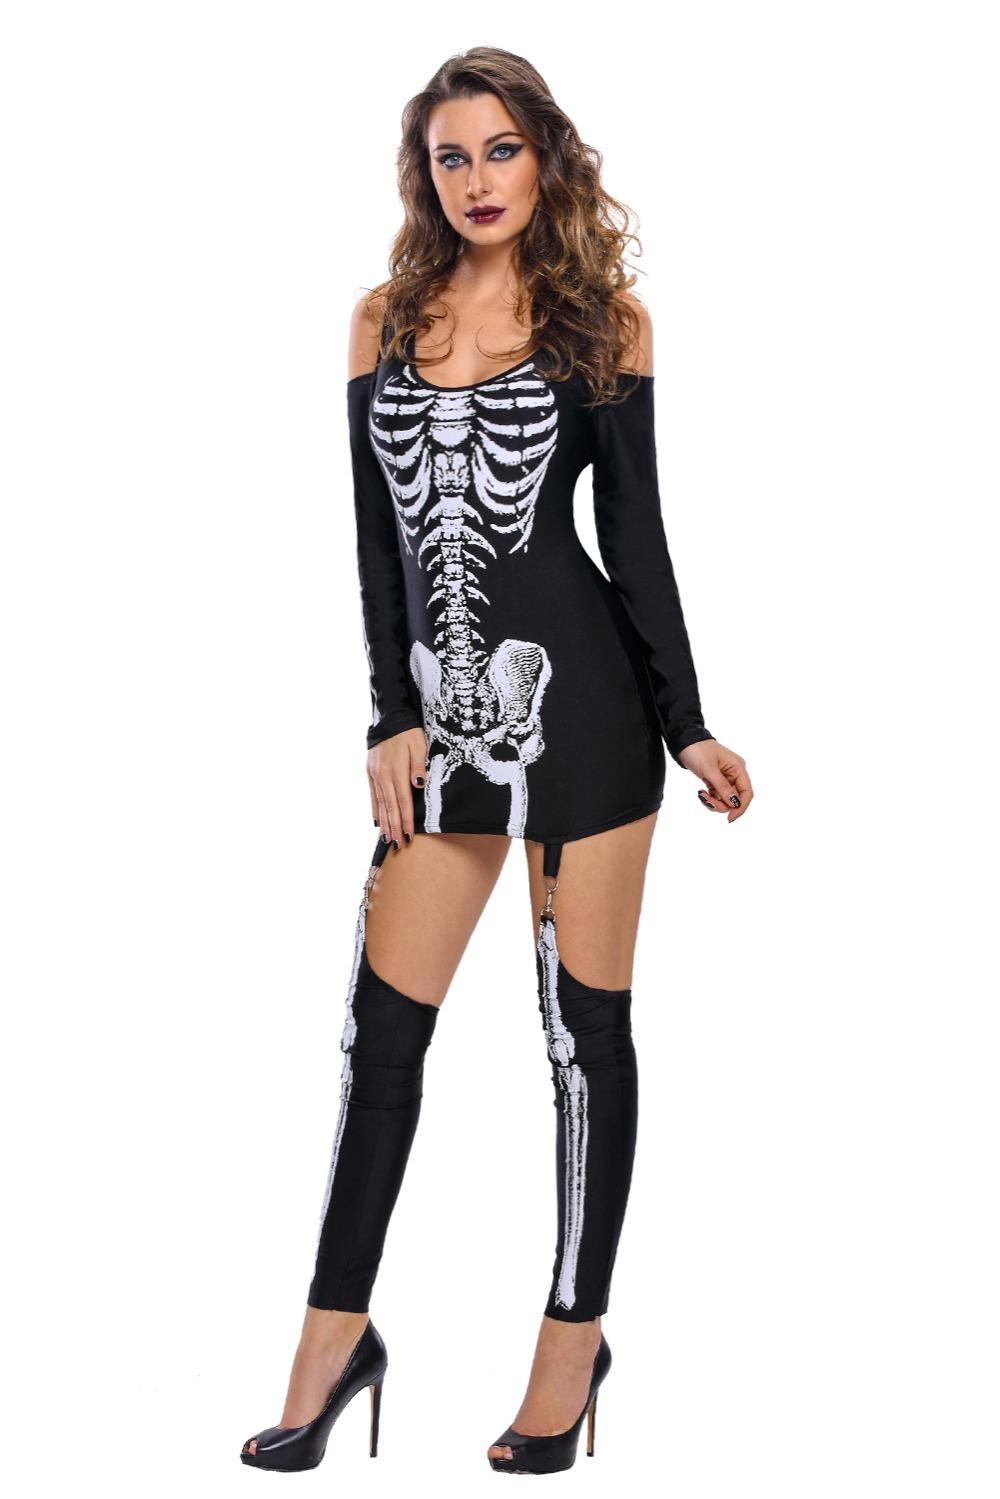 X-rayed-Halloween-Off-shoulder-Skeleton-Dress-Costume-LC89025-2-6